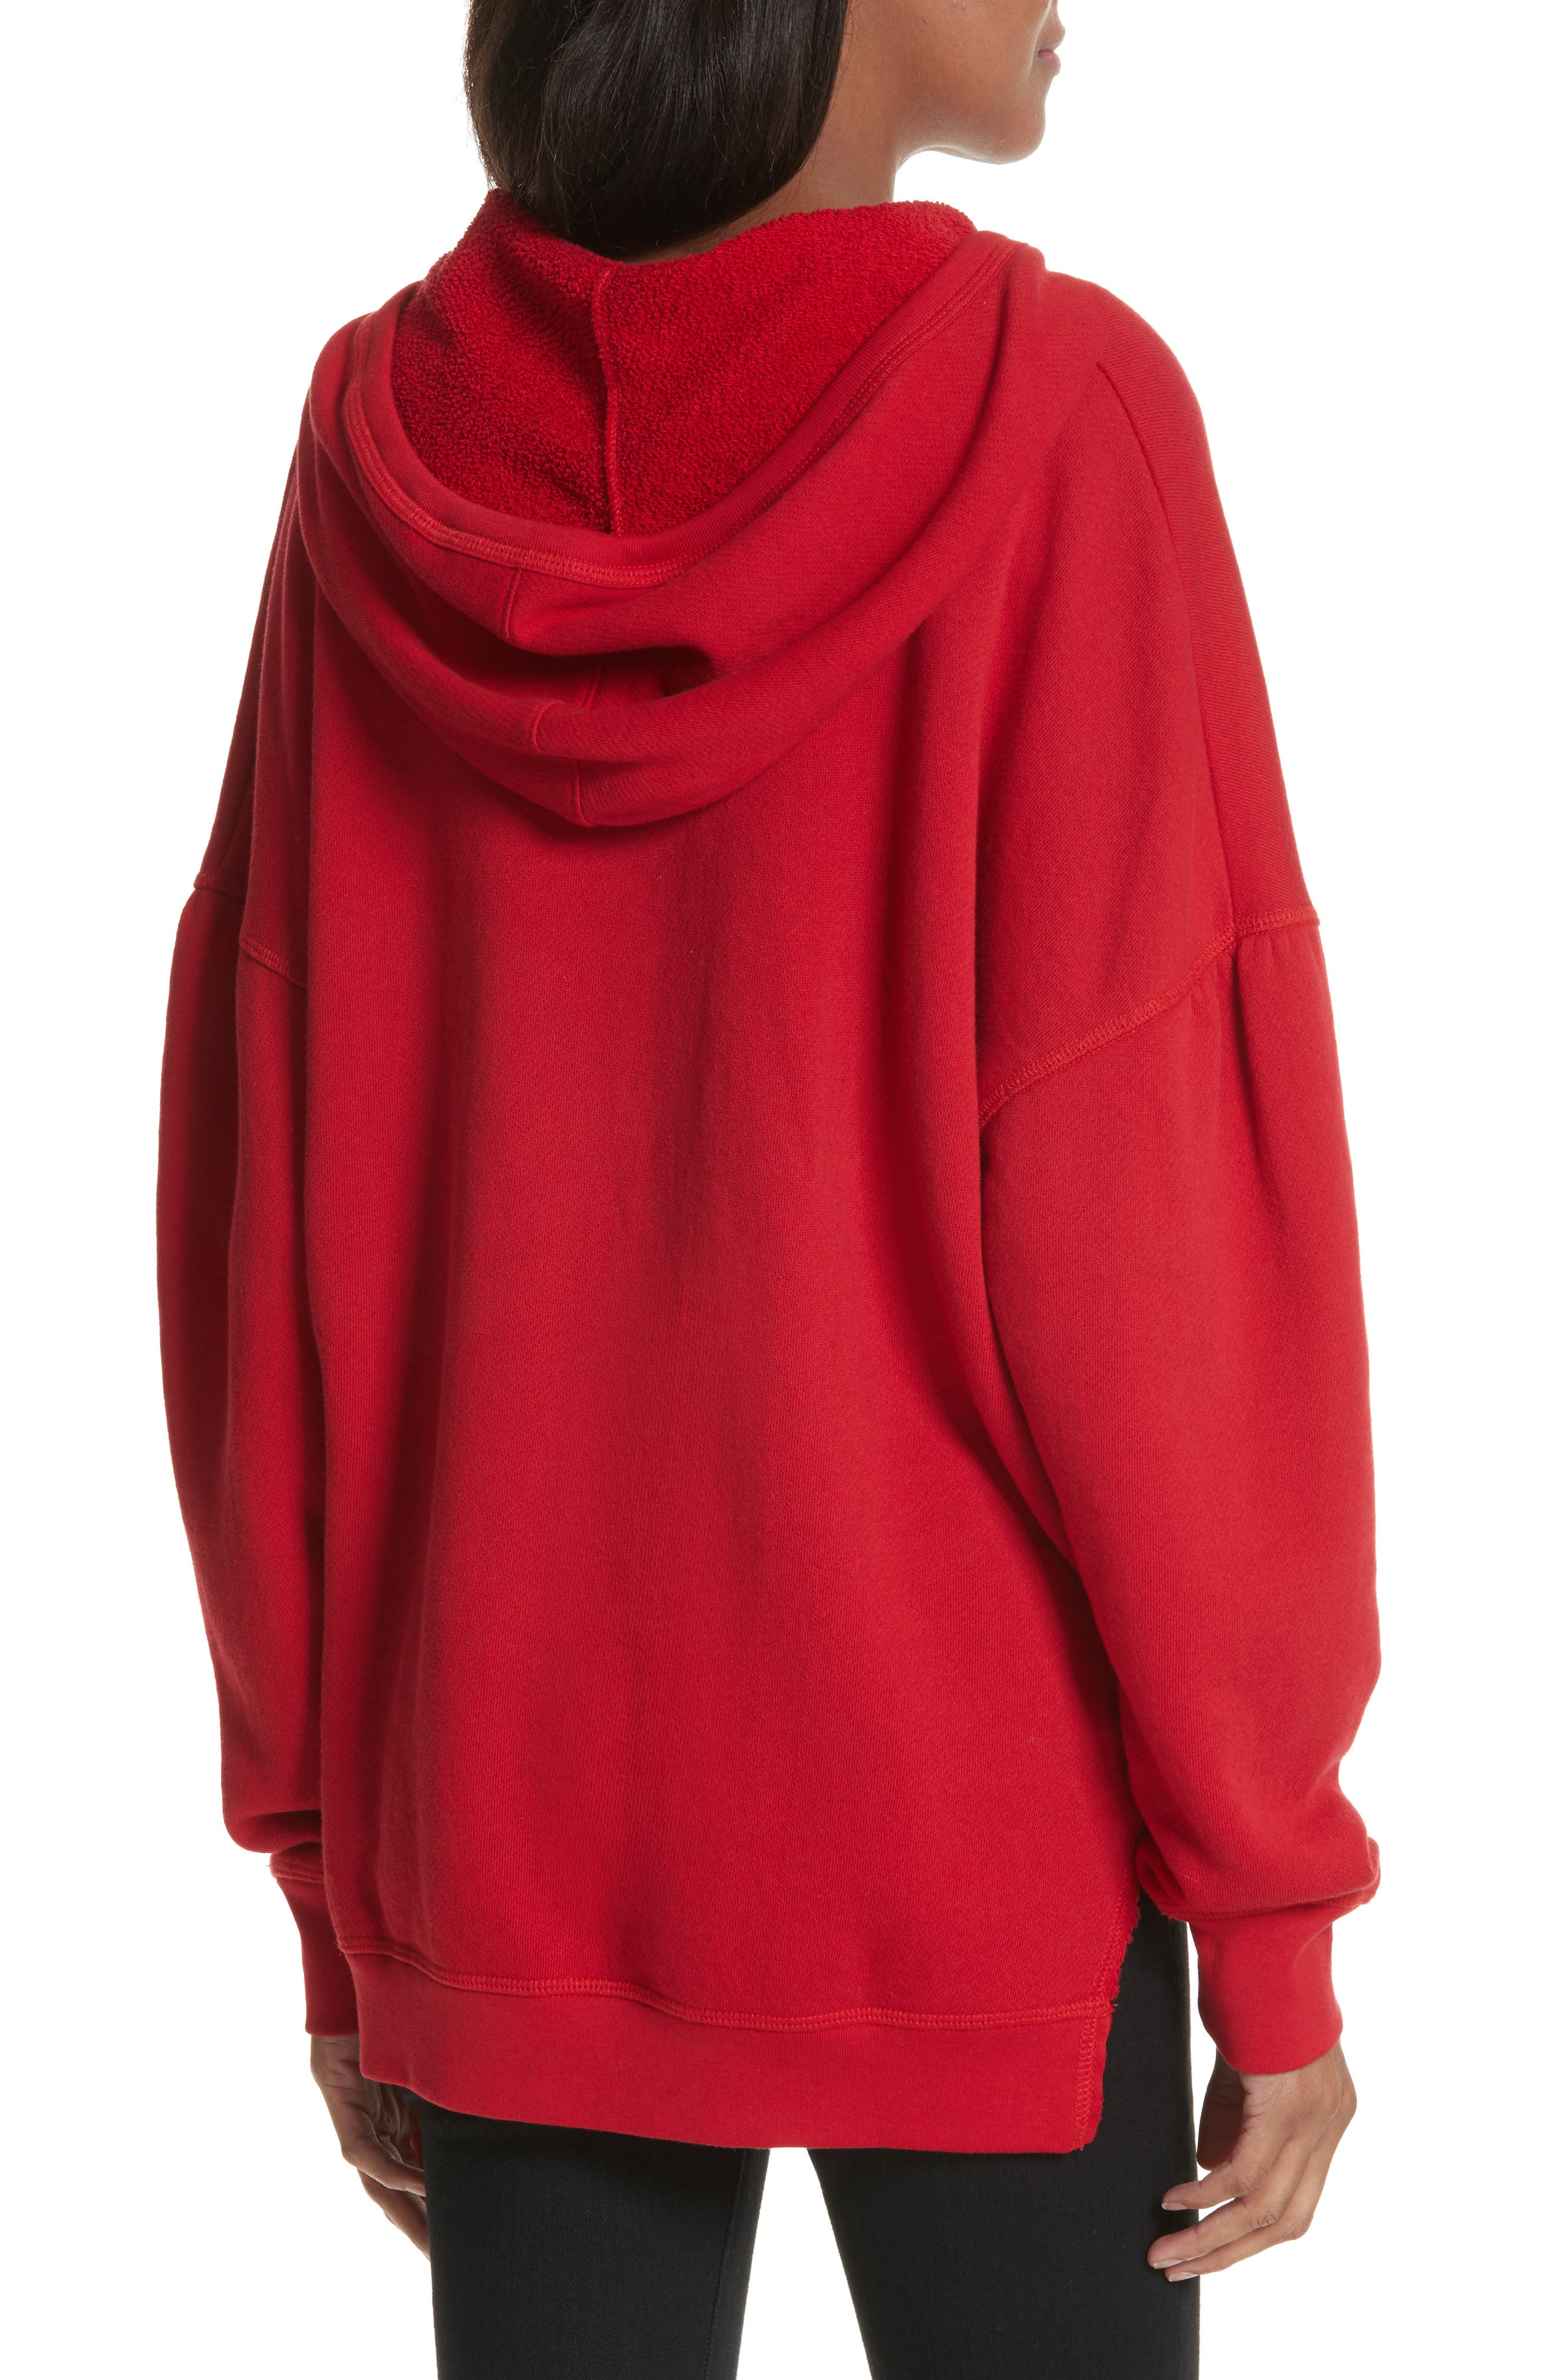 Adene Hooded Sweatshirt,                             Alternate thumbnail 2, color,                             600